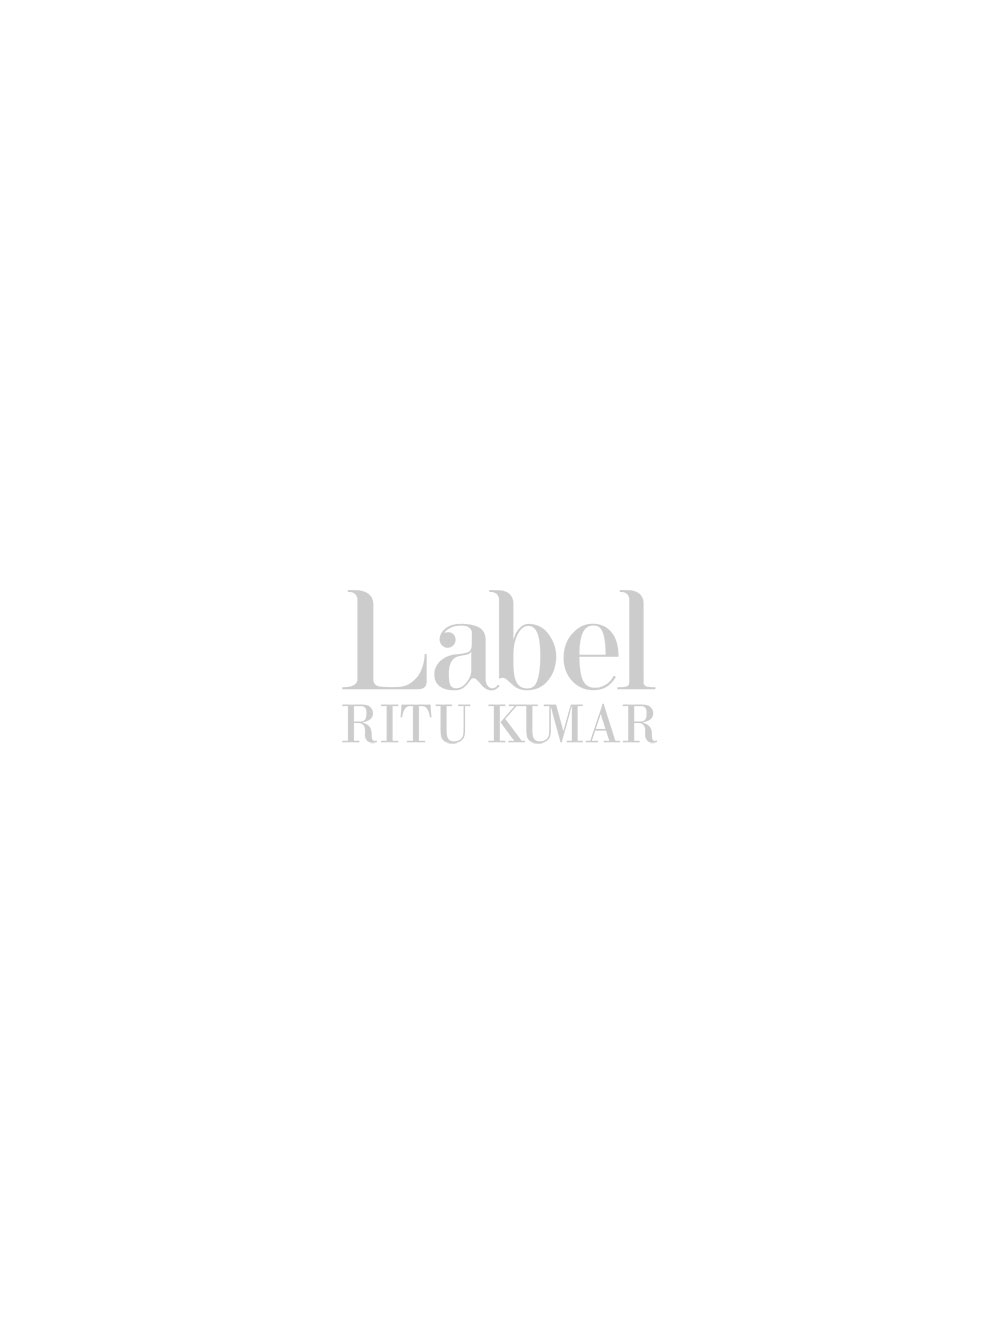 Black Printed Jumpsuit by label ritu kumar